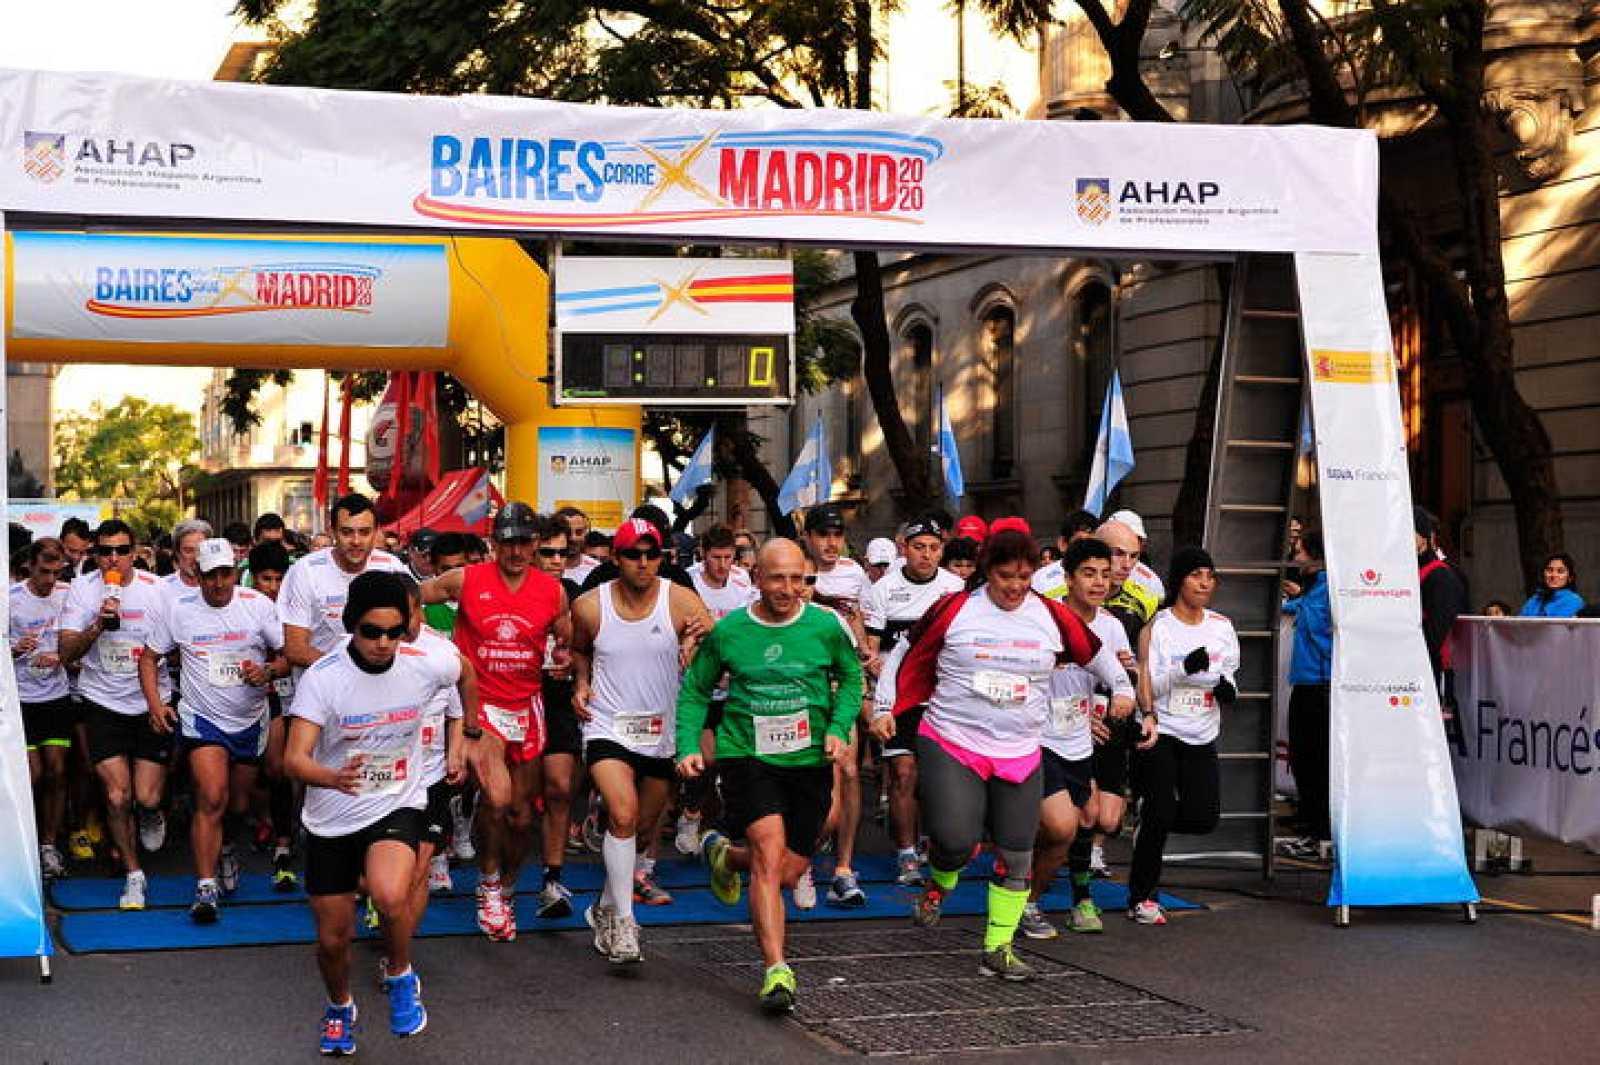 Un maratón popular hispano argentino apoyó a Madrid 2020 en Buenos Aires